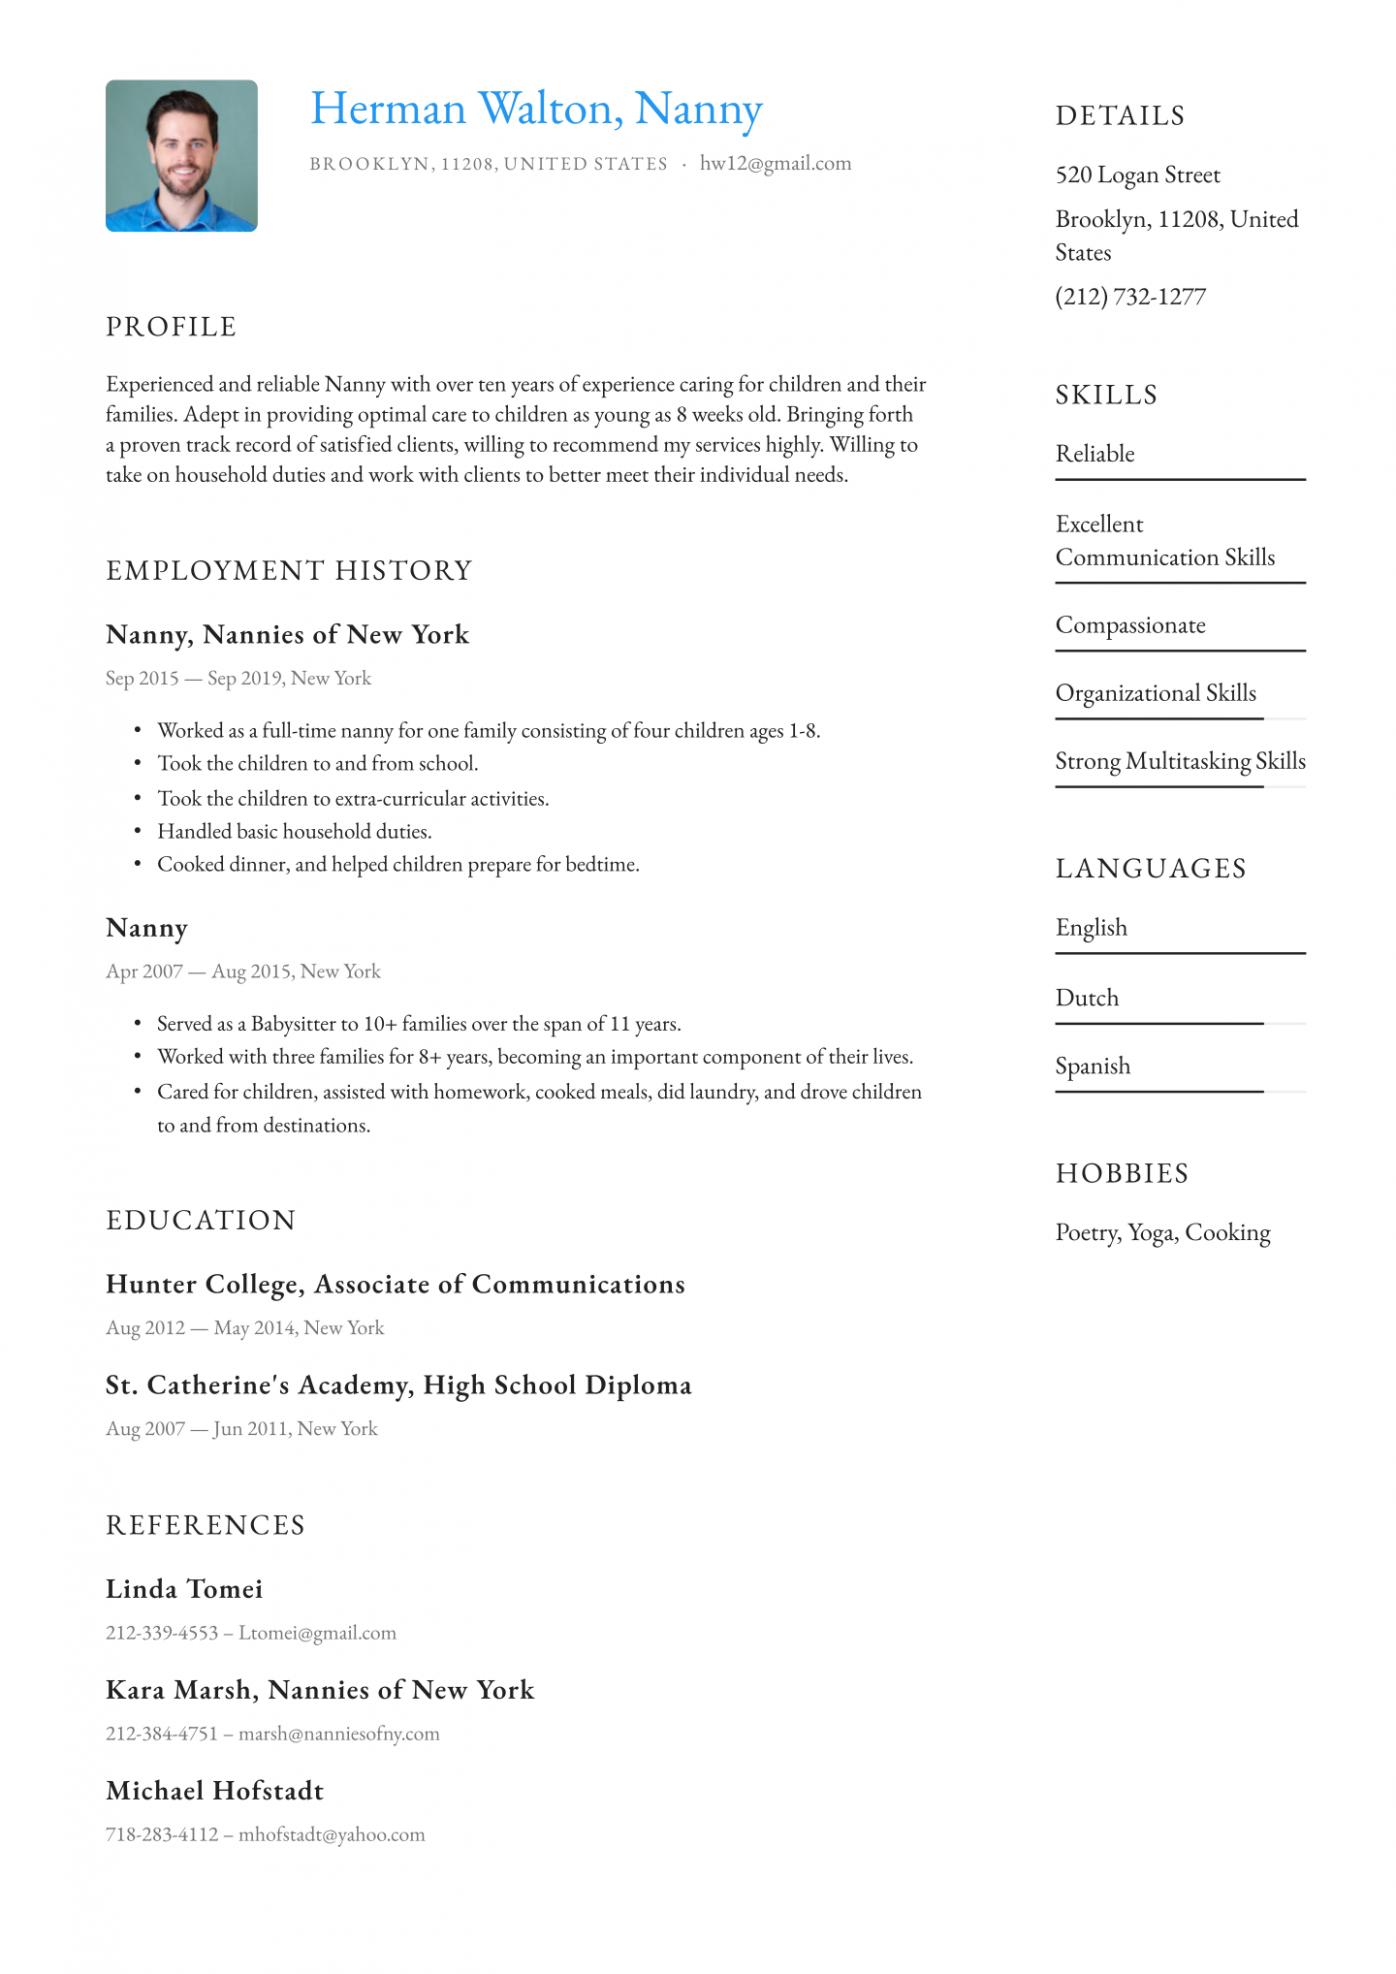 10 Nanny Resume Template in 2020 Resume template, Resume